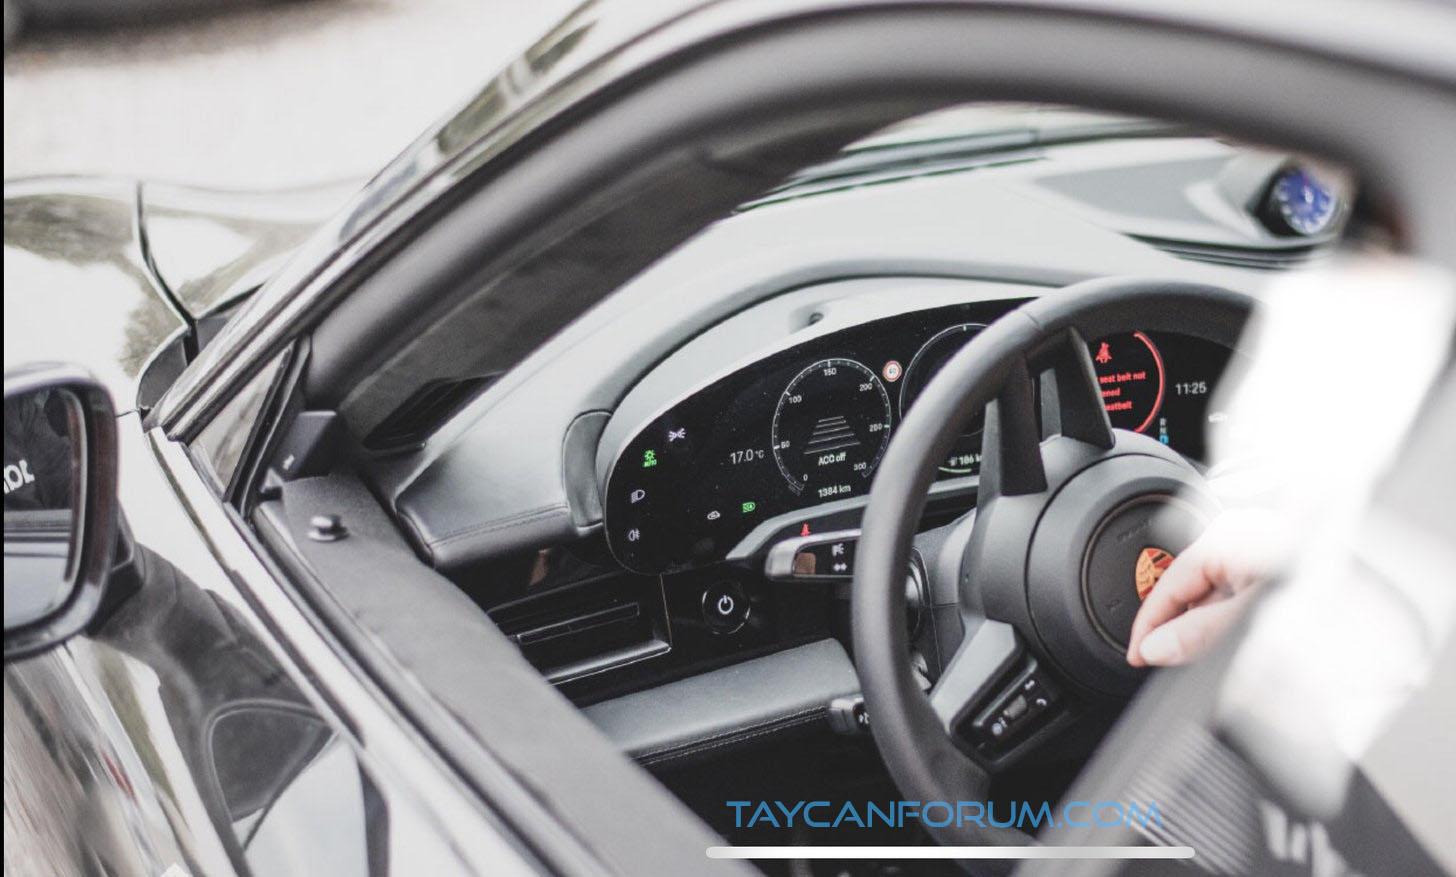 Porsche Taycan - Poze spion - Porsche Taycan - Poze spion